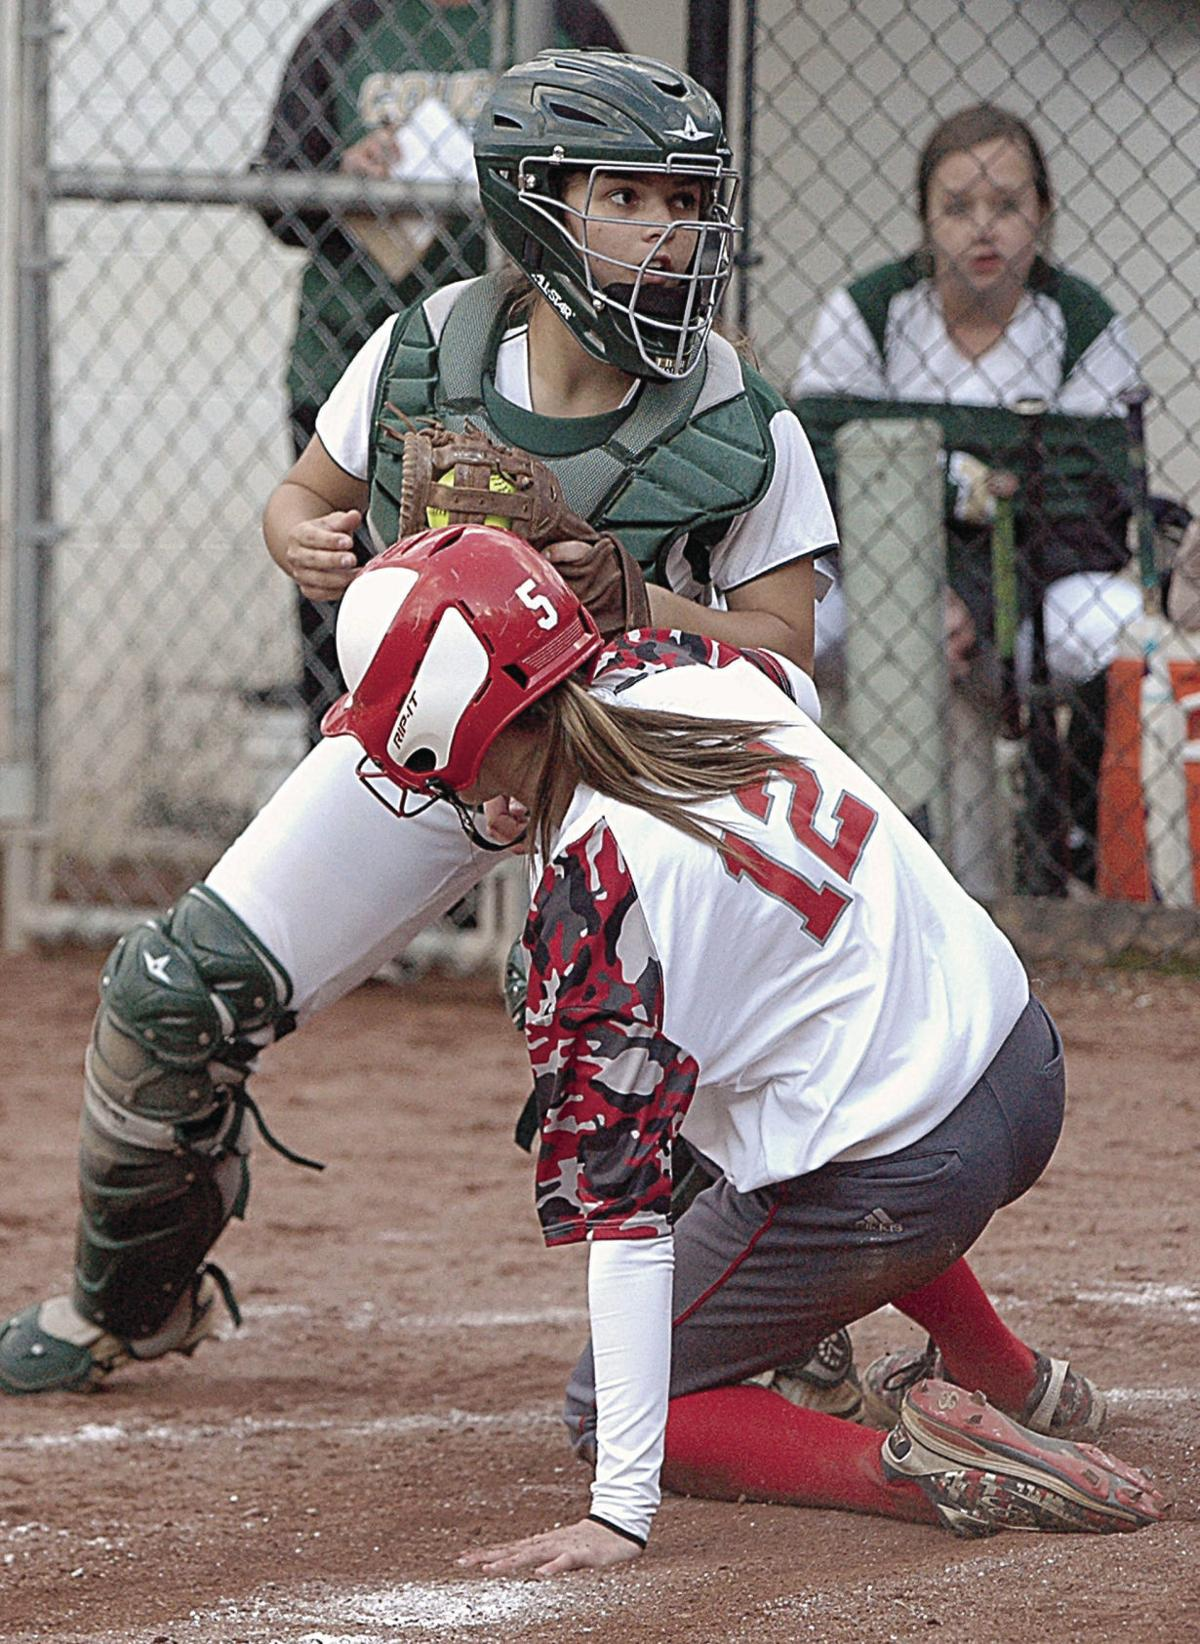 Cundiff, Bryant earn first-team softball laurels in Piedmont